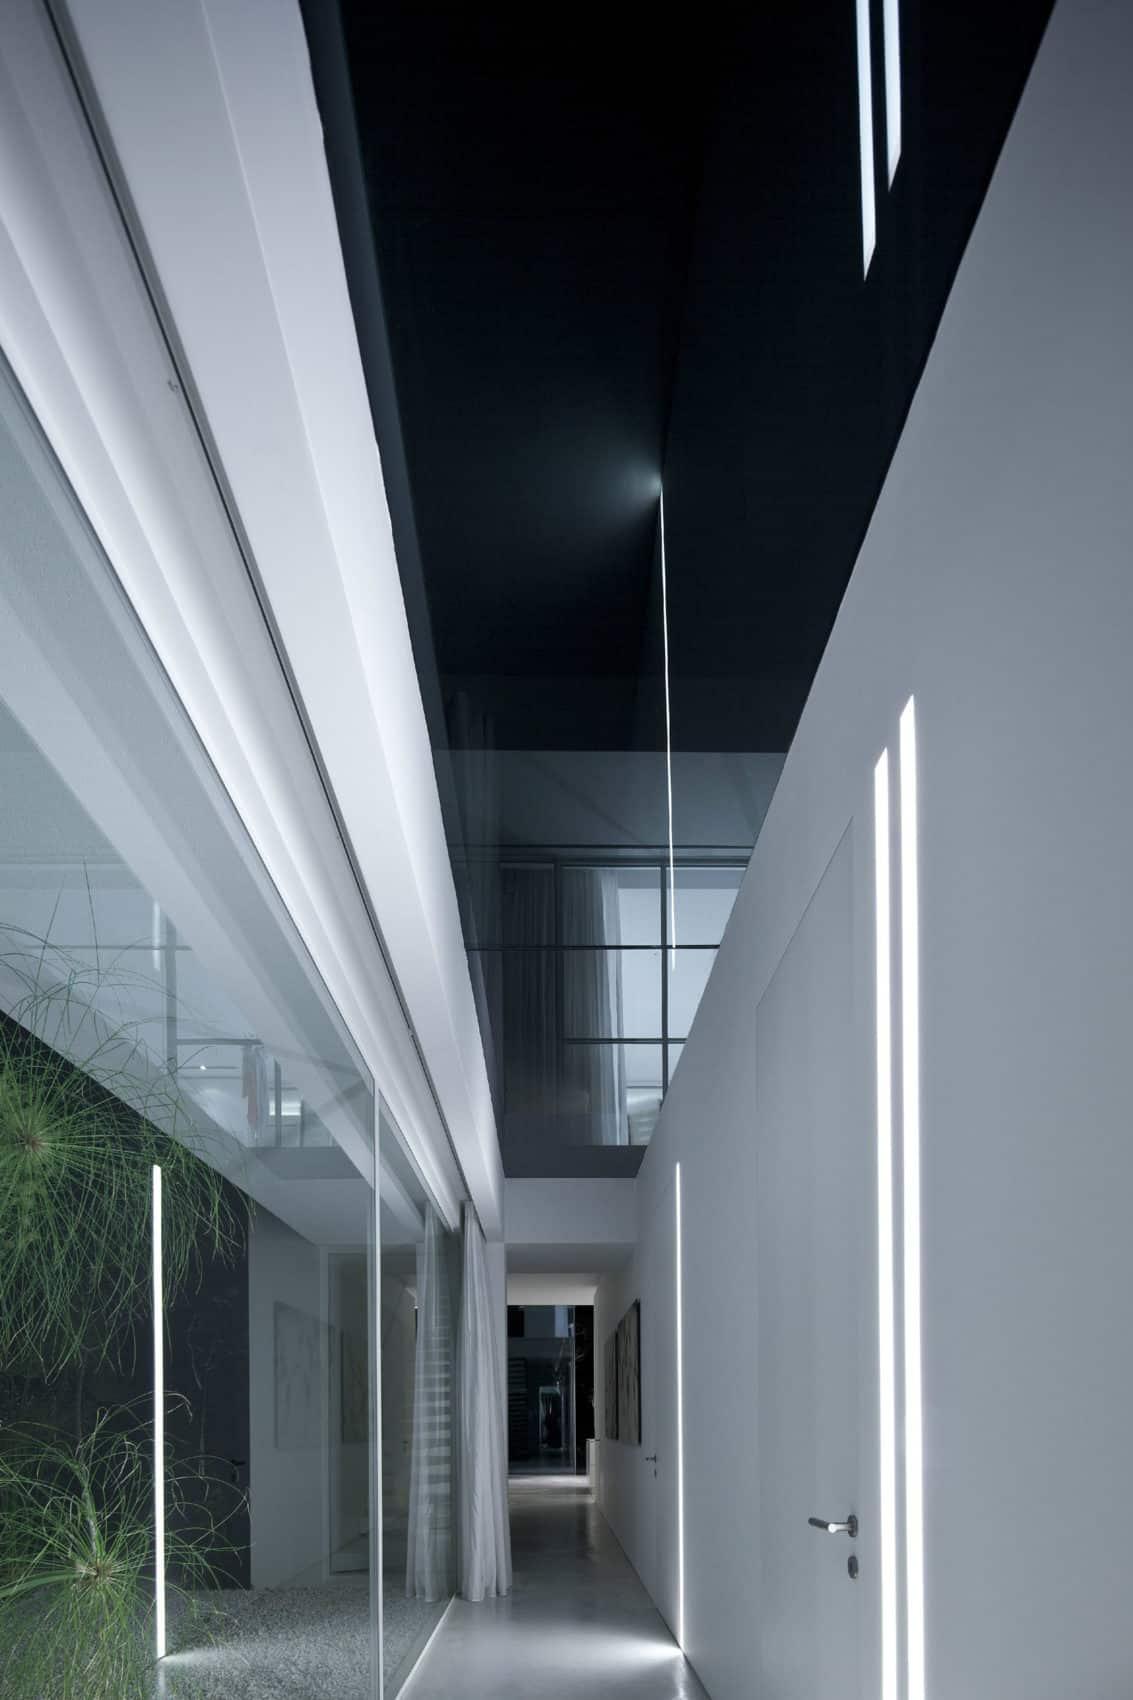 Ramat Hasharon House 13 by Pitsou Kedem Architects (19)